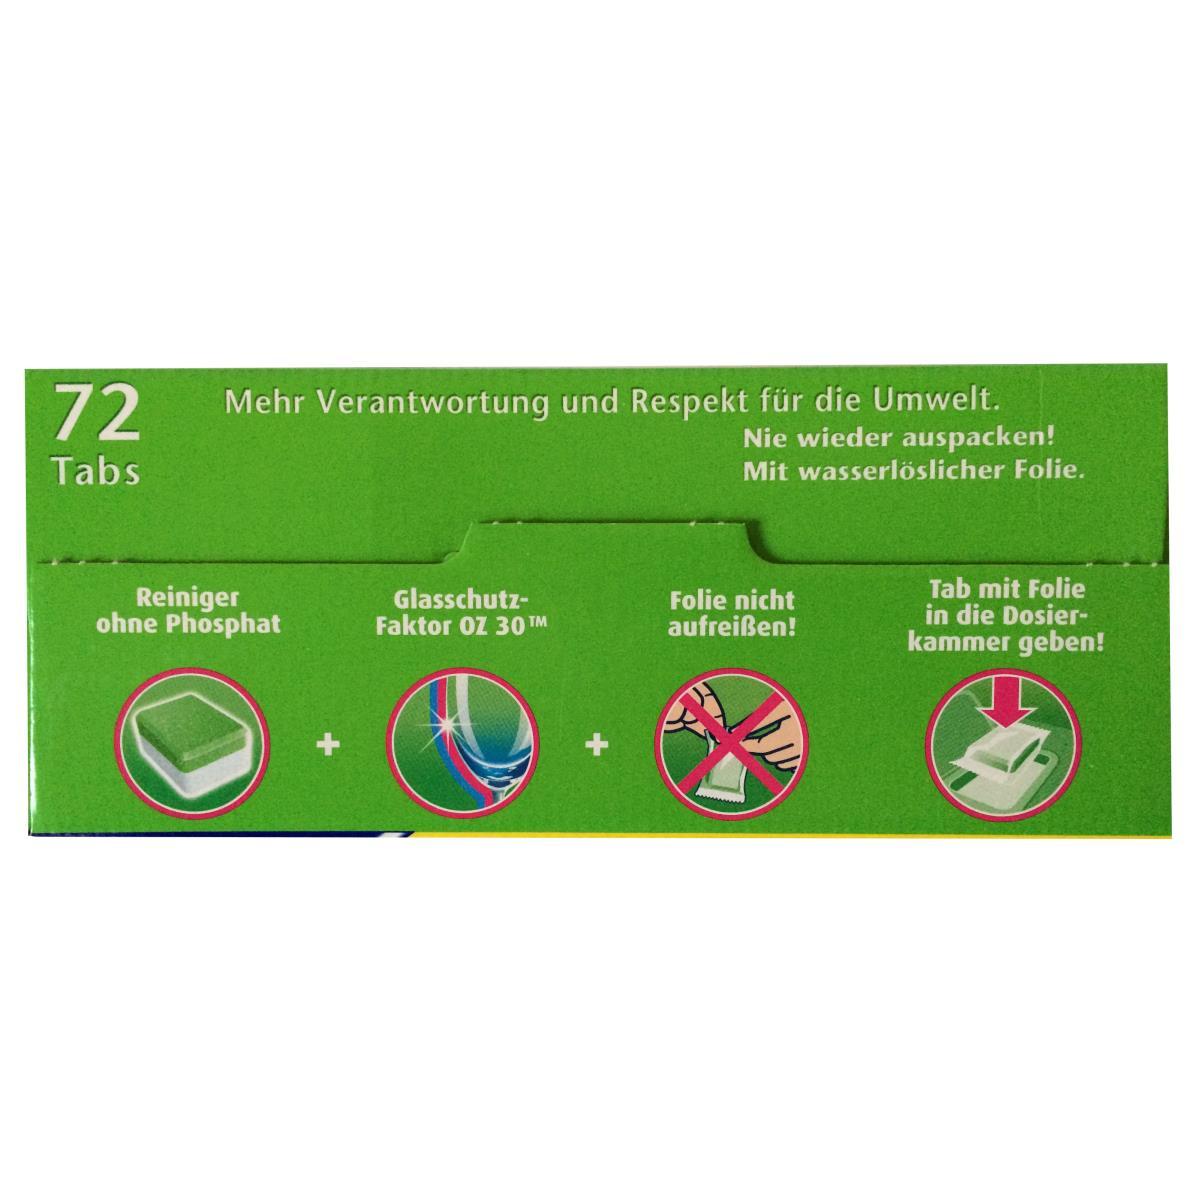 FIT Grüne Kraft Classic 72 Tabs Spülmaschinentabs Geschirrspültabs,Fit,4013162016280, 4013162016280